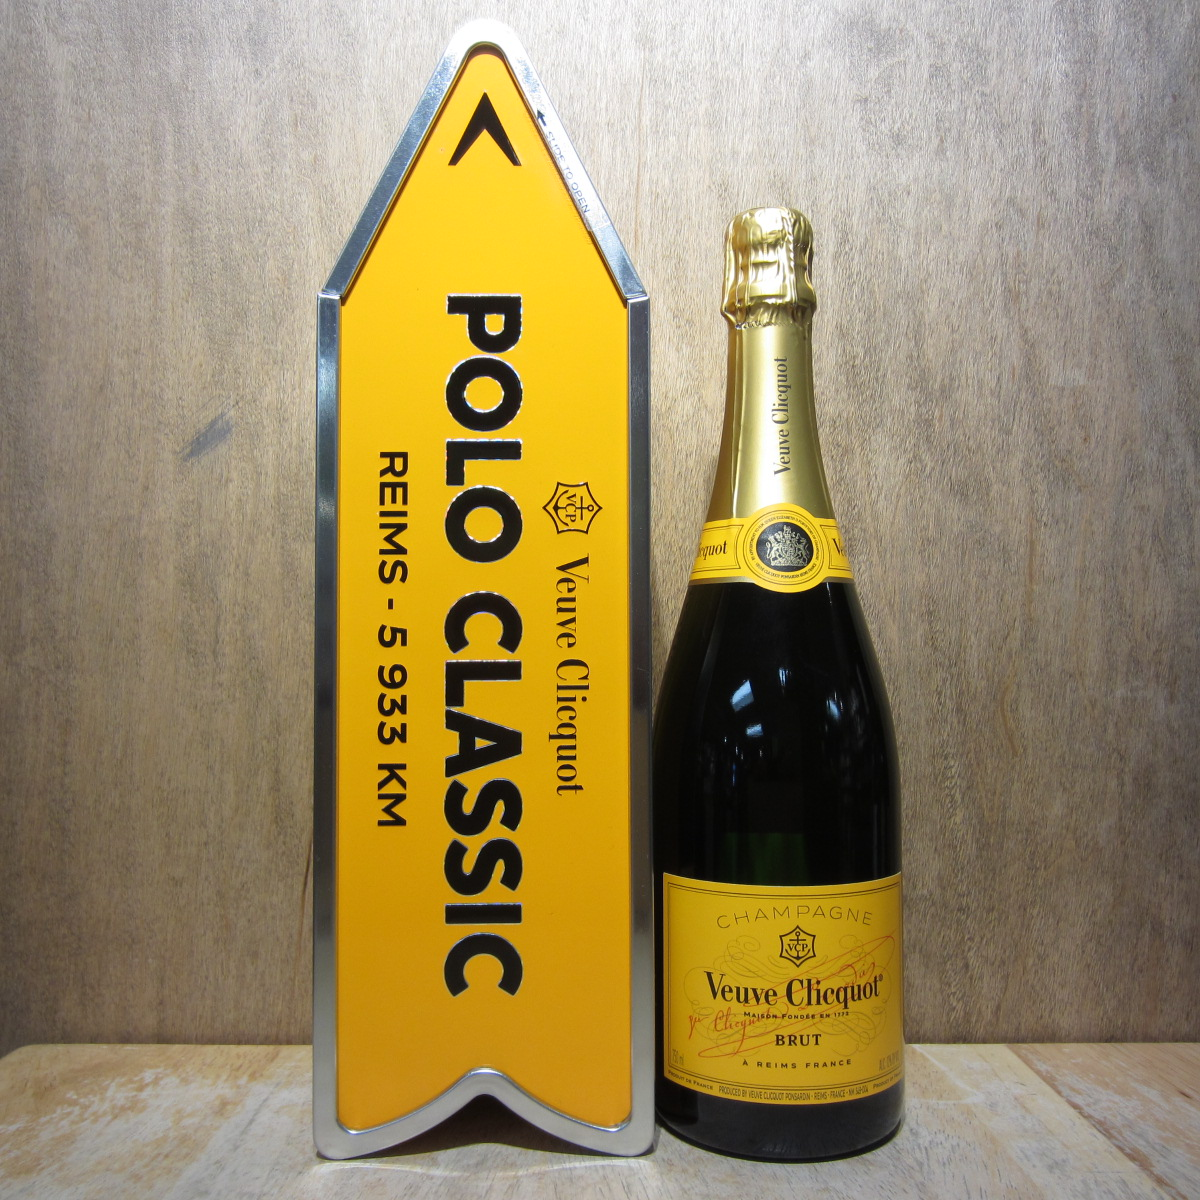 Veuve Clicquot Polo Classic Arrow 750ml